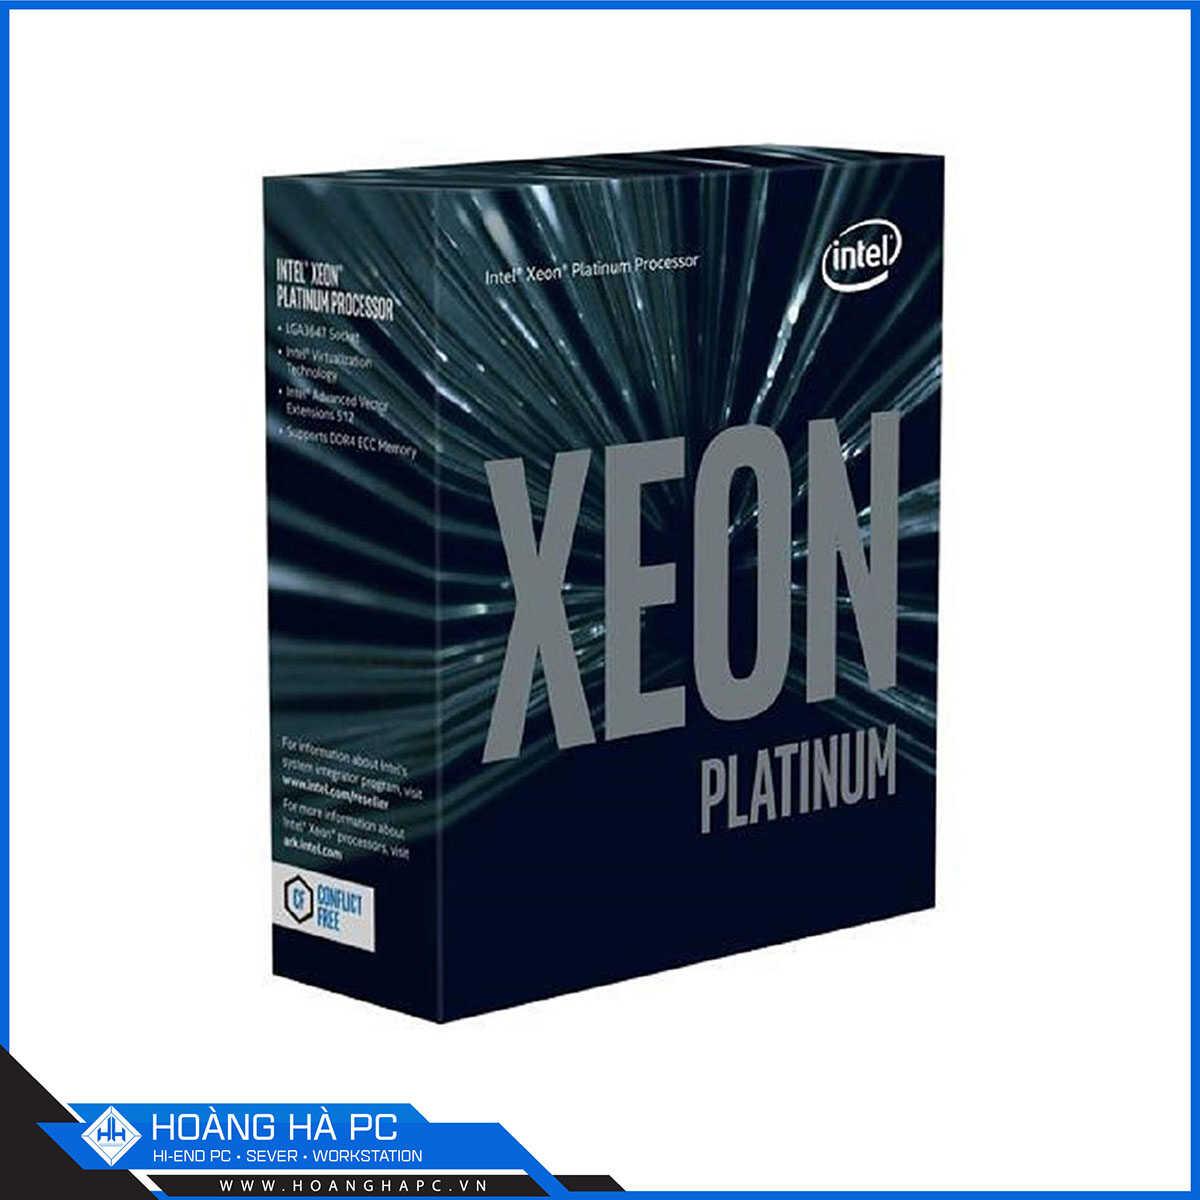 Intel Xeon Platinum 8269CY